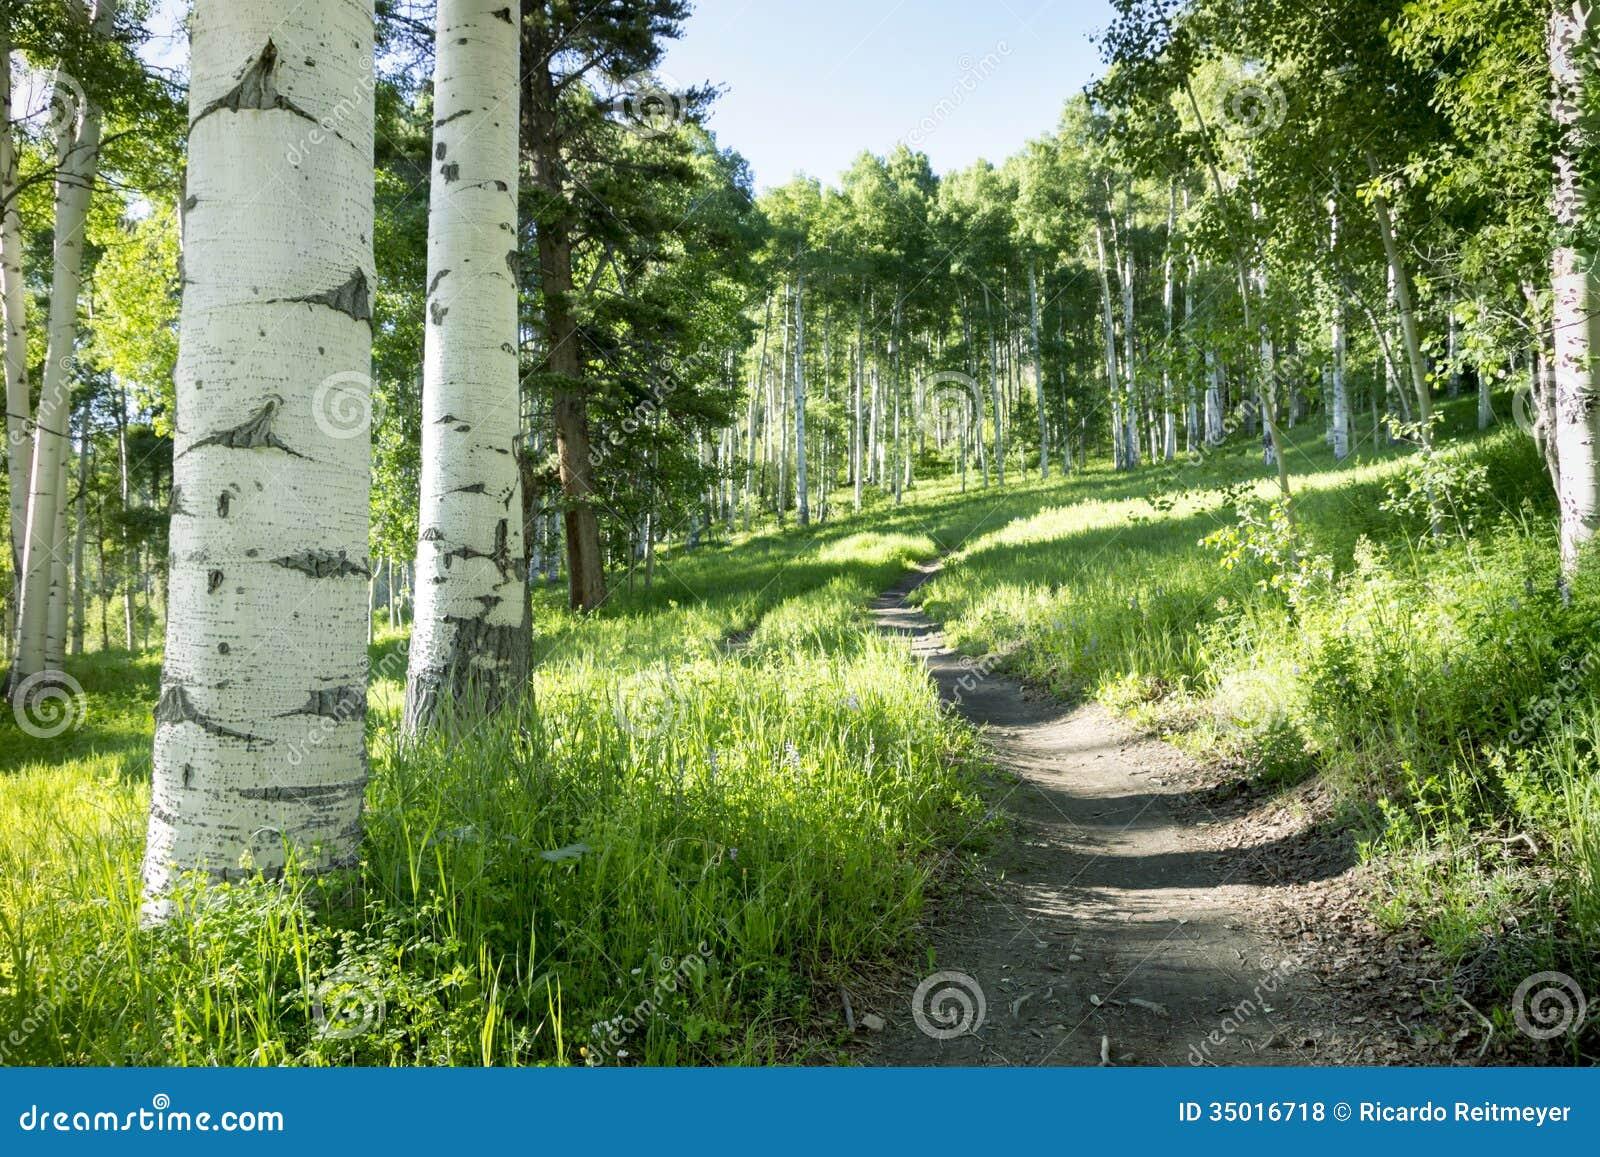 Mooie Berg Wandelingssleep door Aspen Trees van Vail Colorado